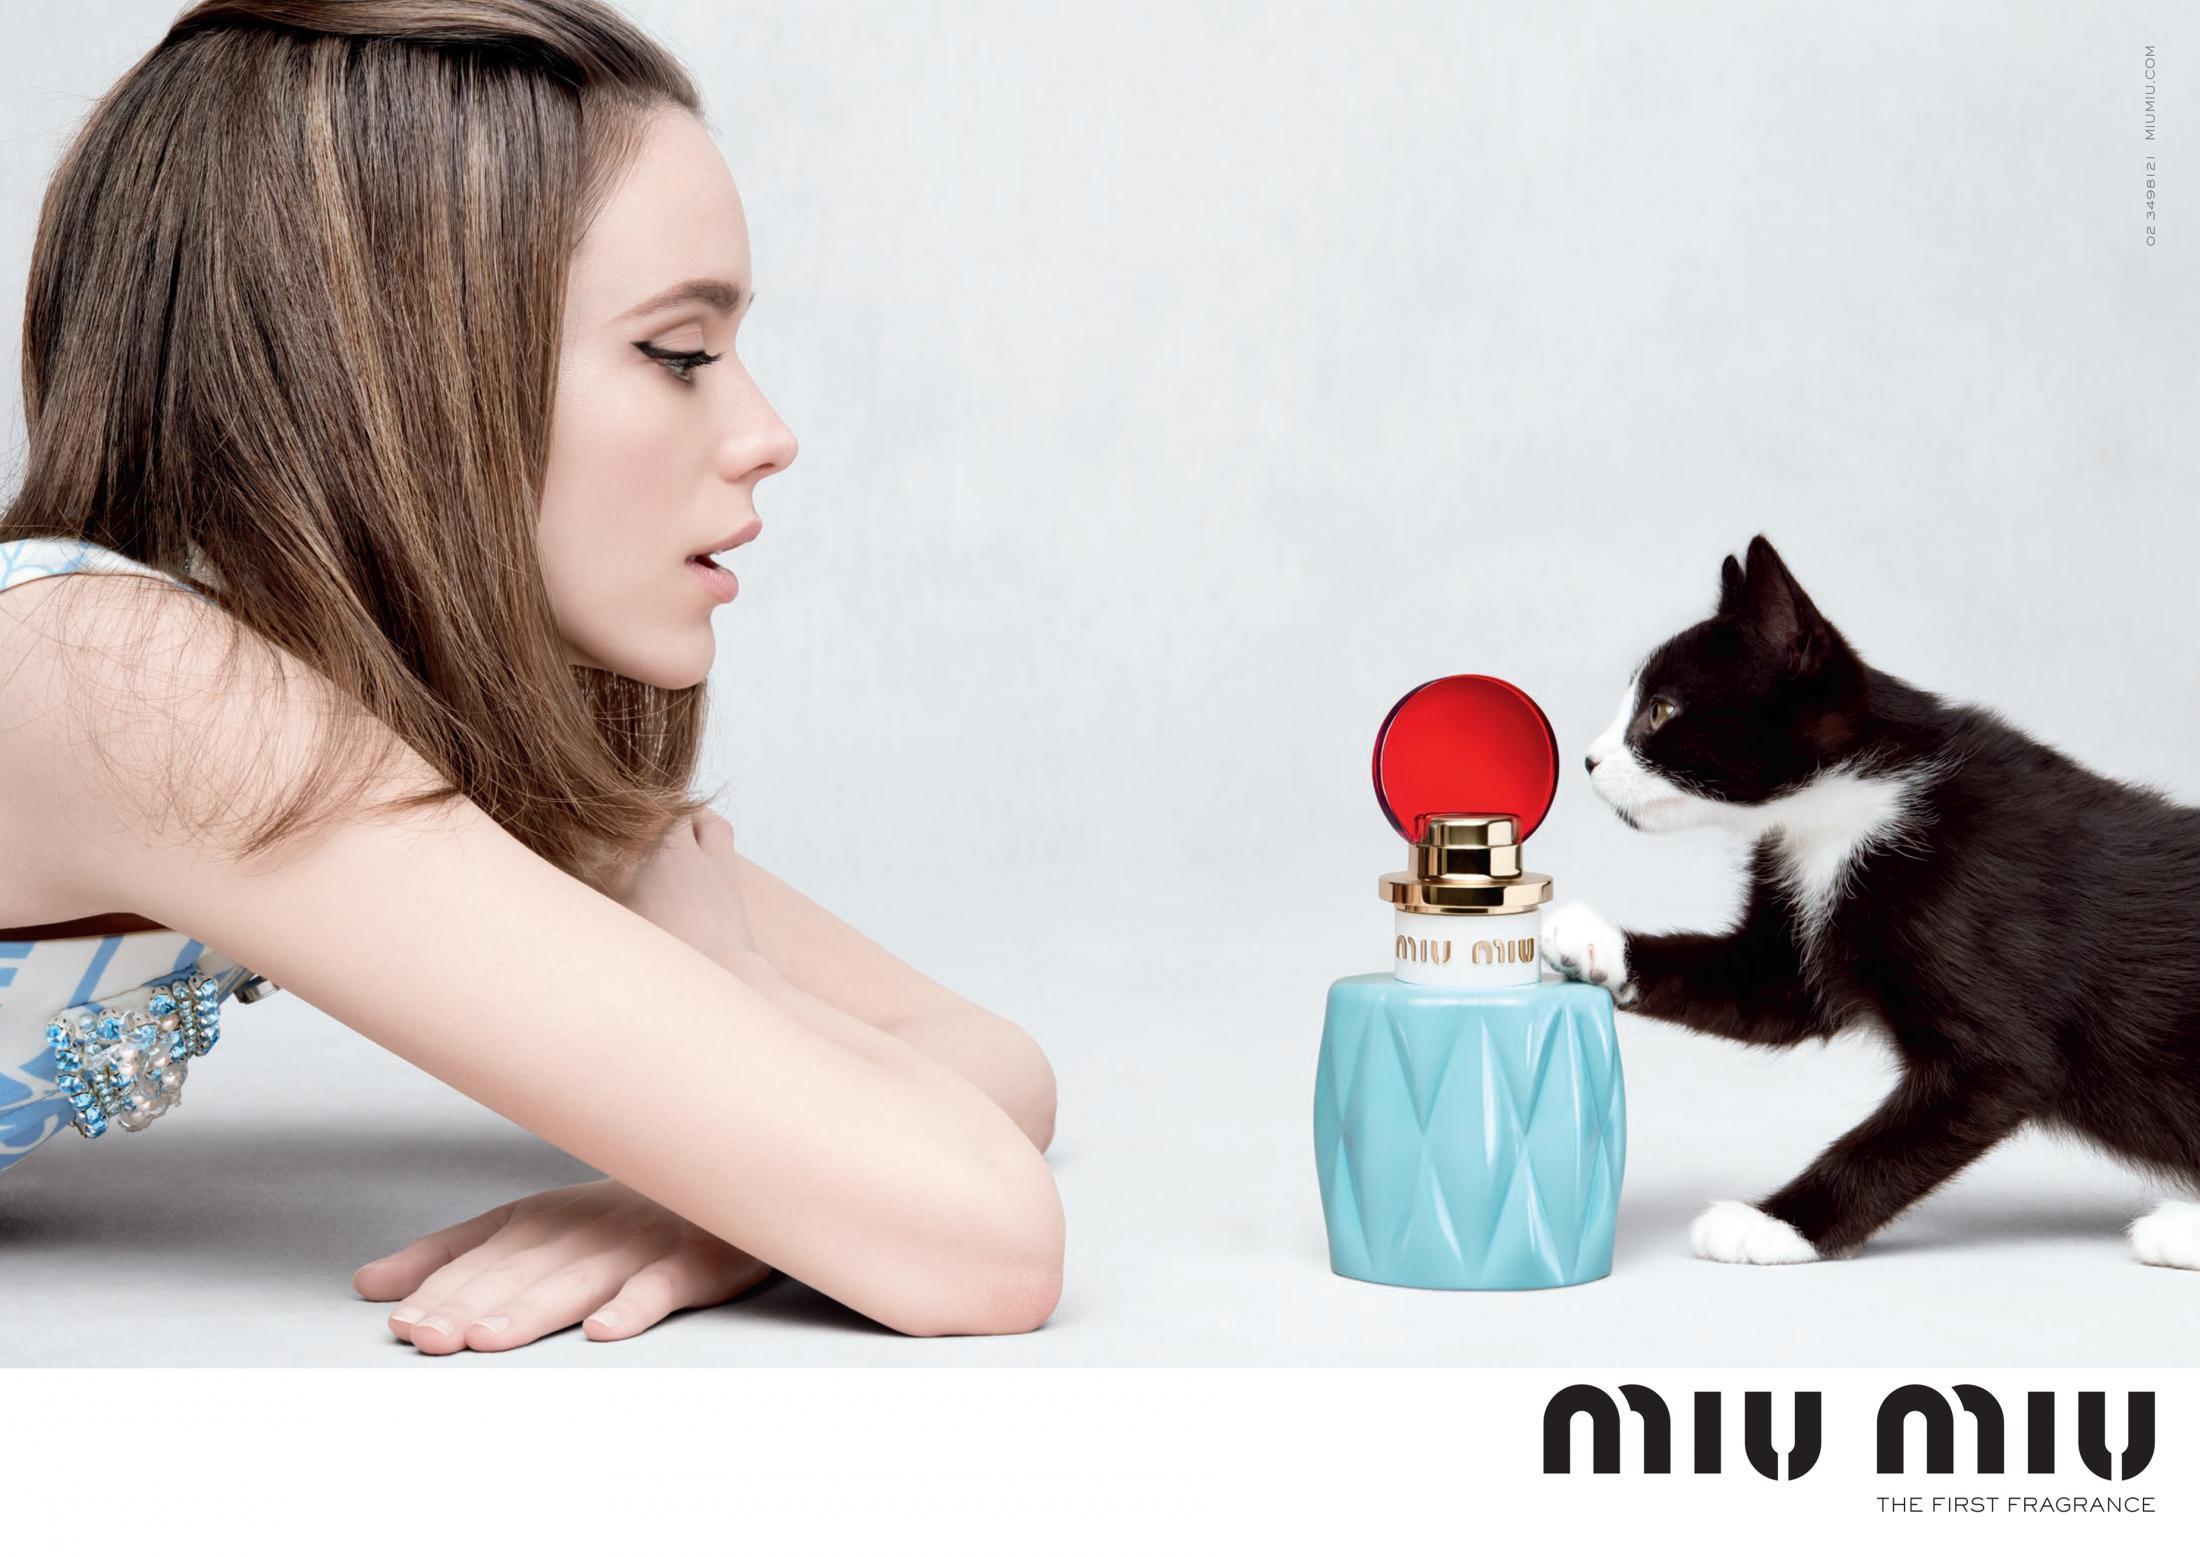 Thumbnail for Miu Miu The First Fragrance